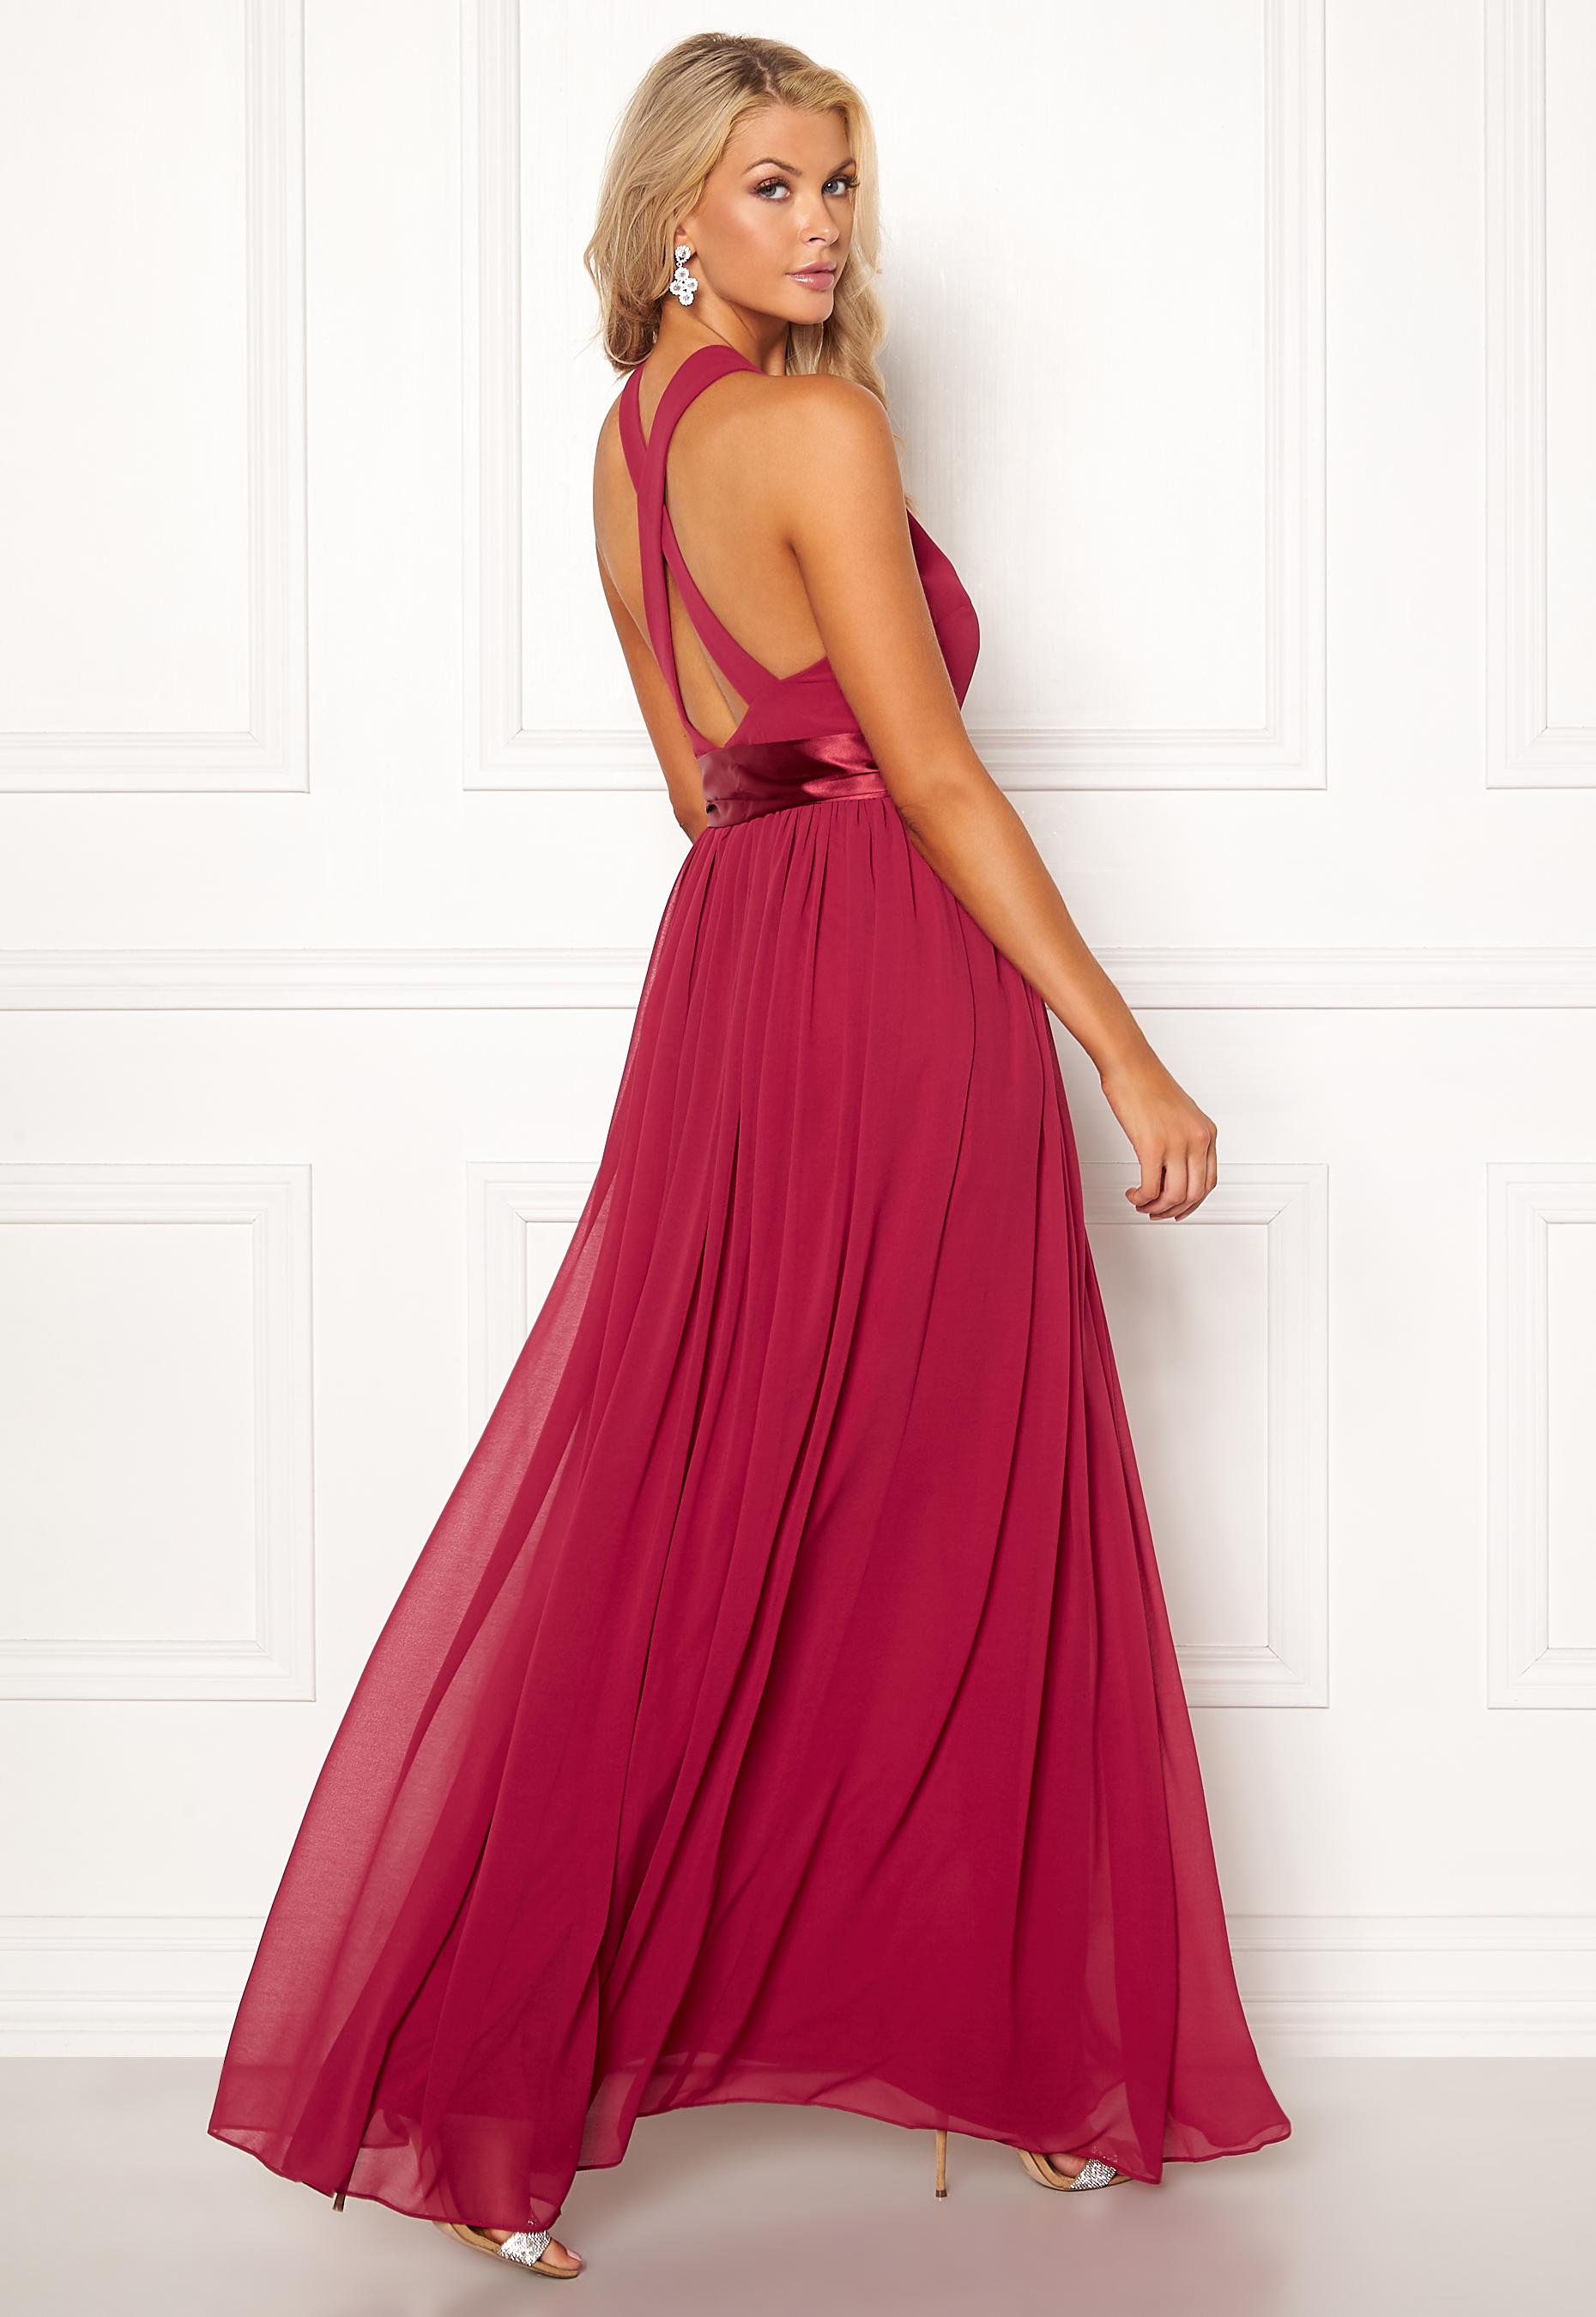 a44868713ffc Goddiva Cross Back Chiffon Dress Raspberry - Bubbleroom